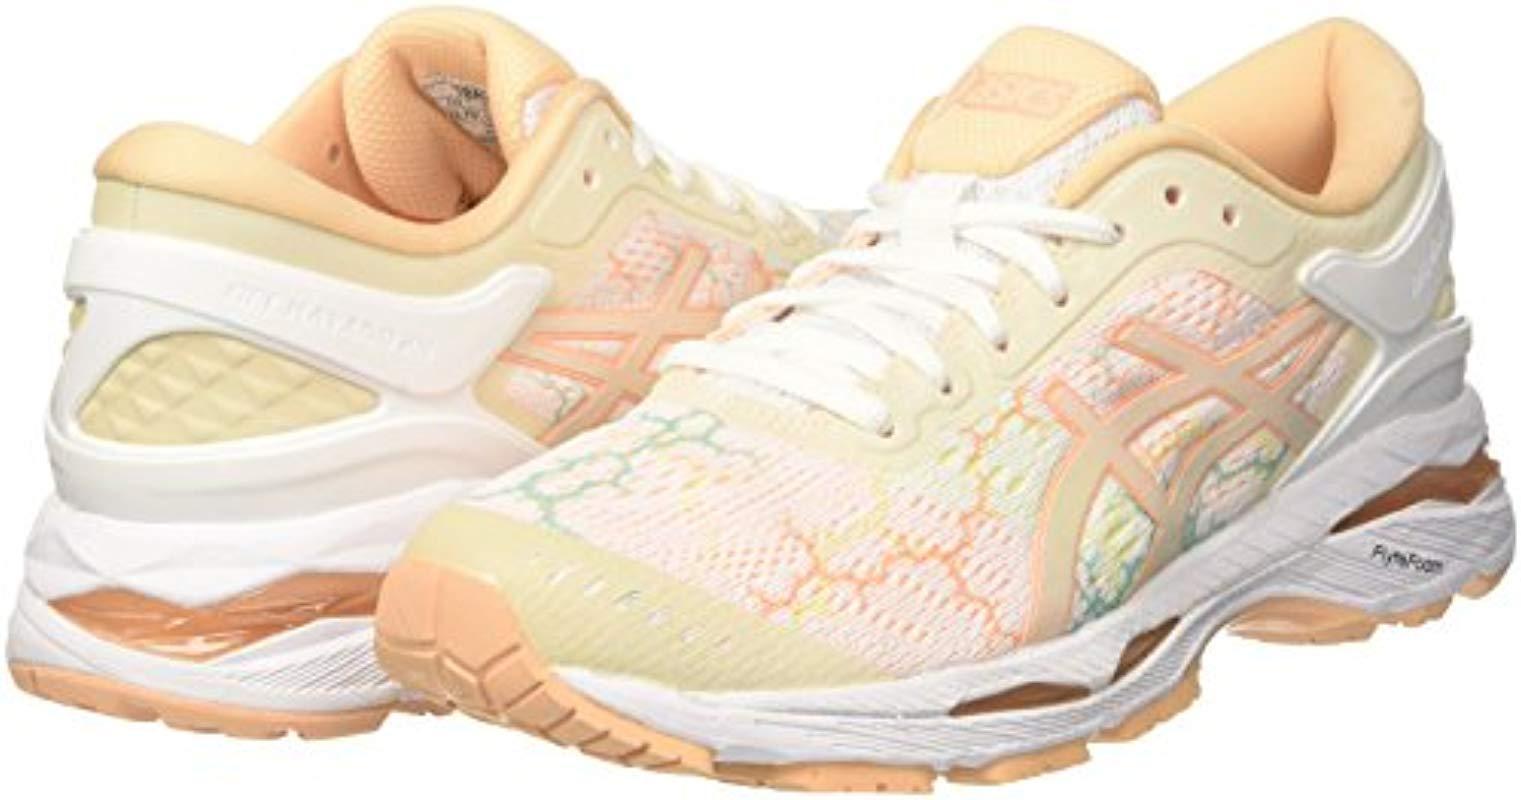 e155c2db8f22d Asics Multicolor Gel-kayano 24 Lite-show Running Shoes